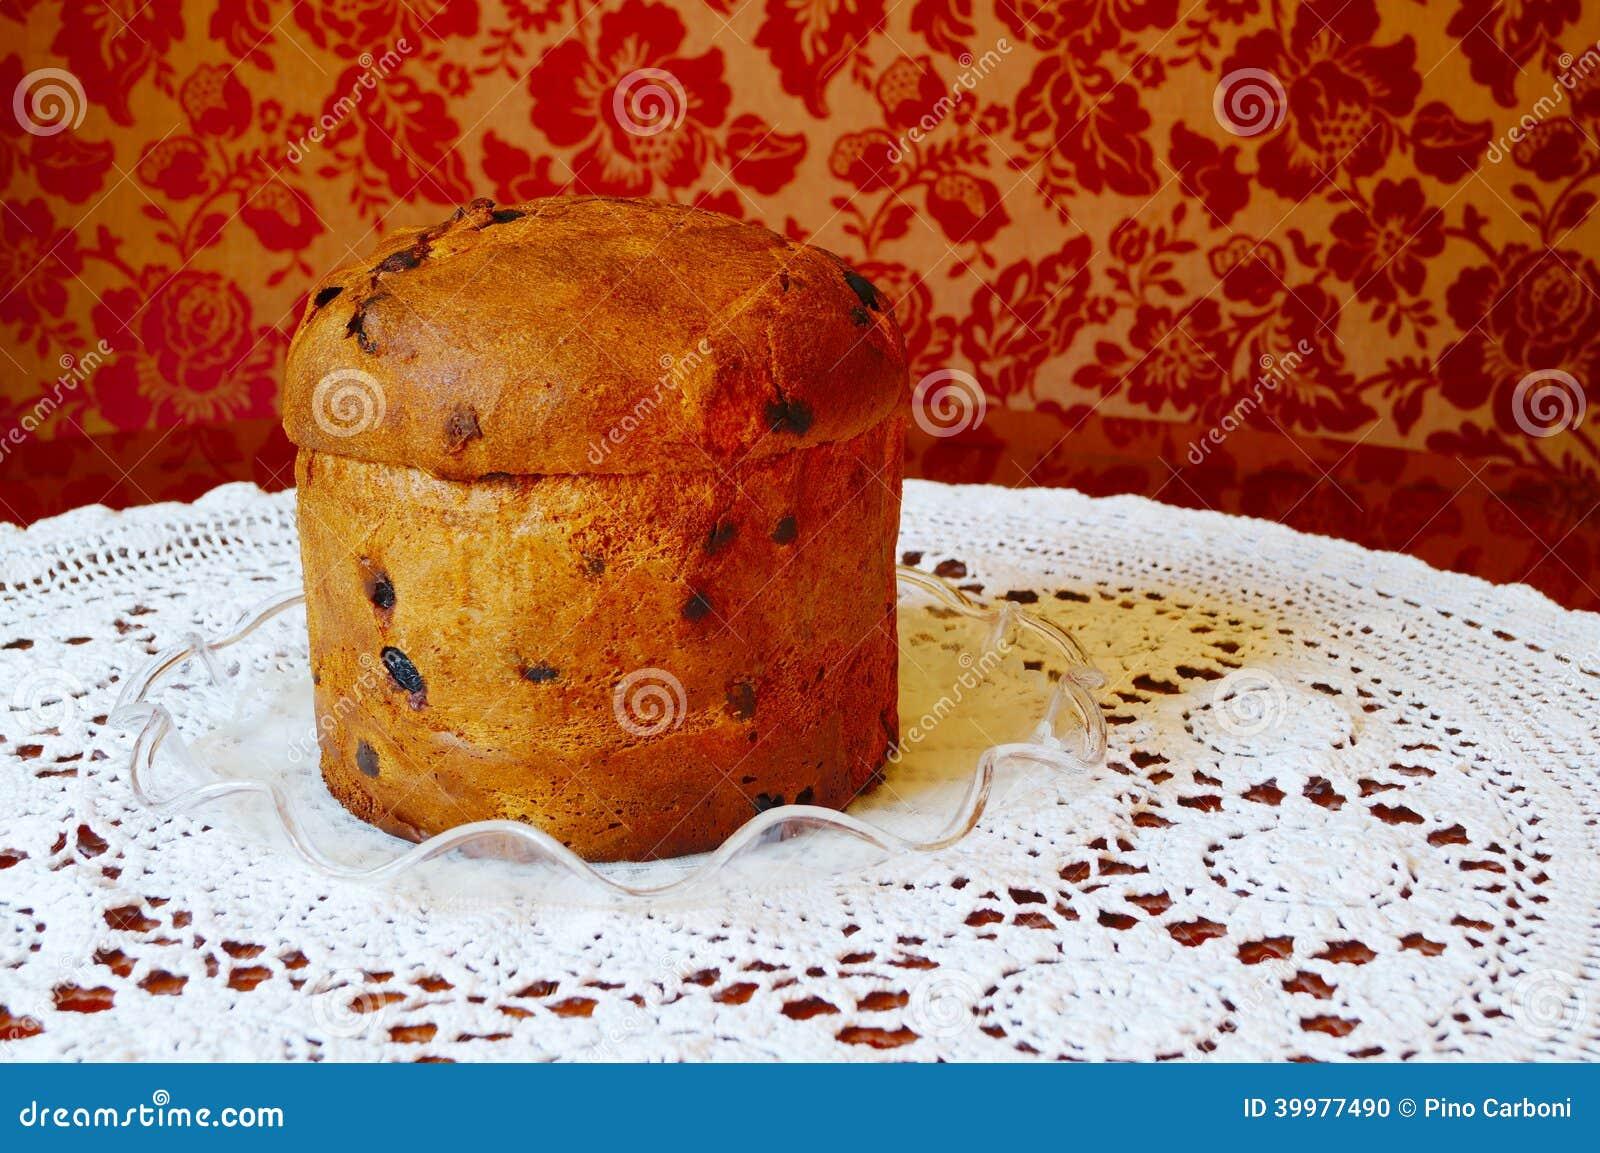 Italian Fruit Cake Recipes: Christmas Italian Fruit Cake Panettone Stock Photo